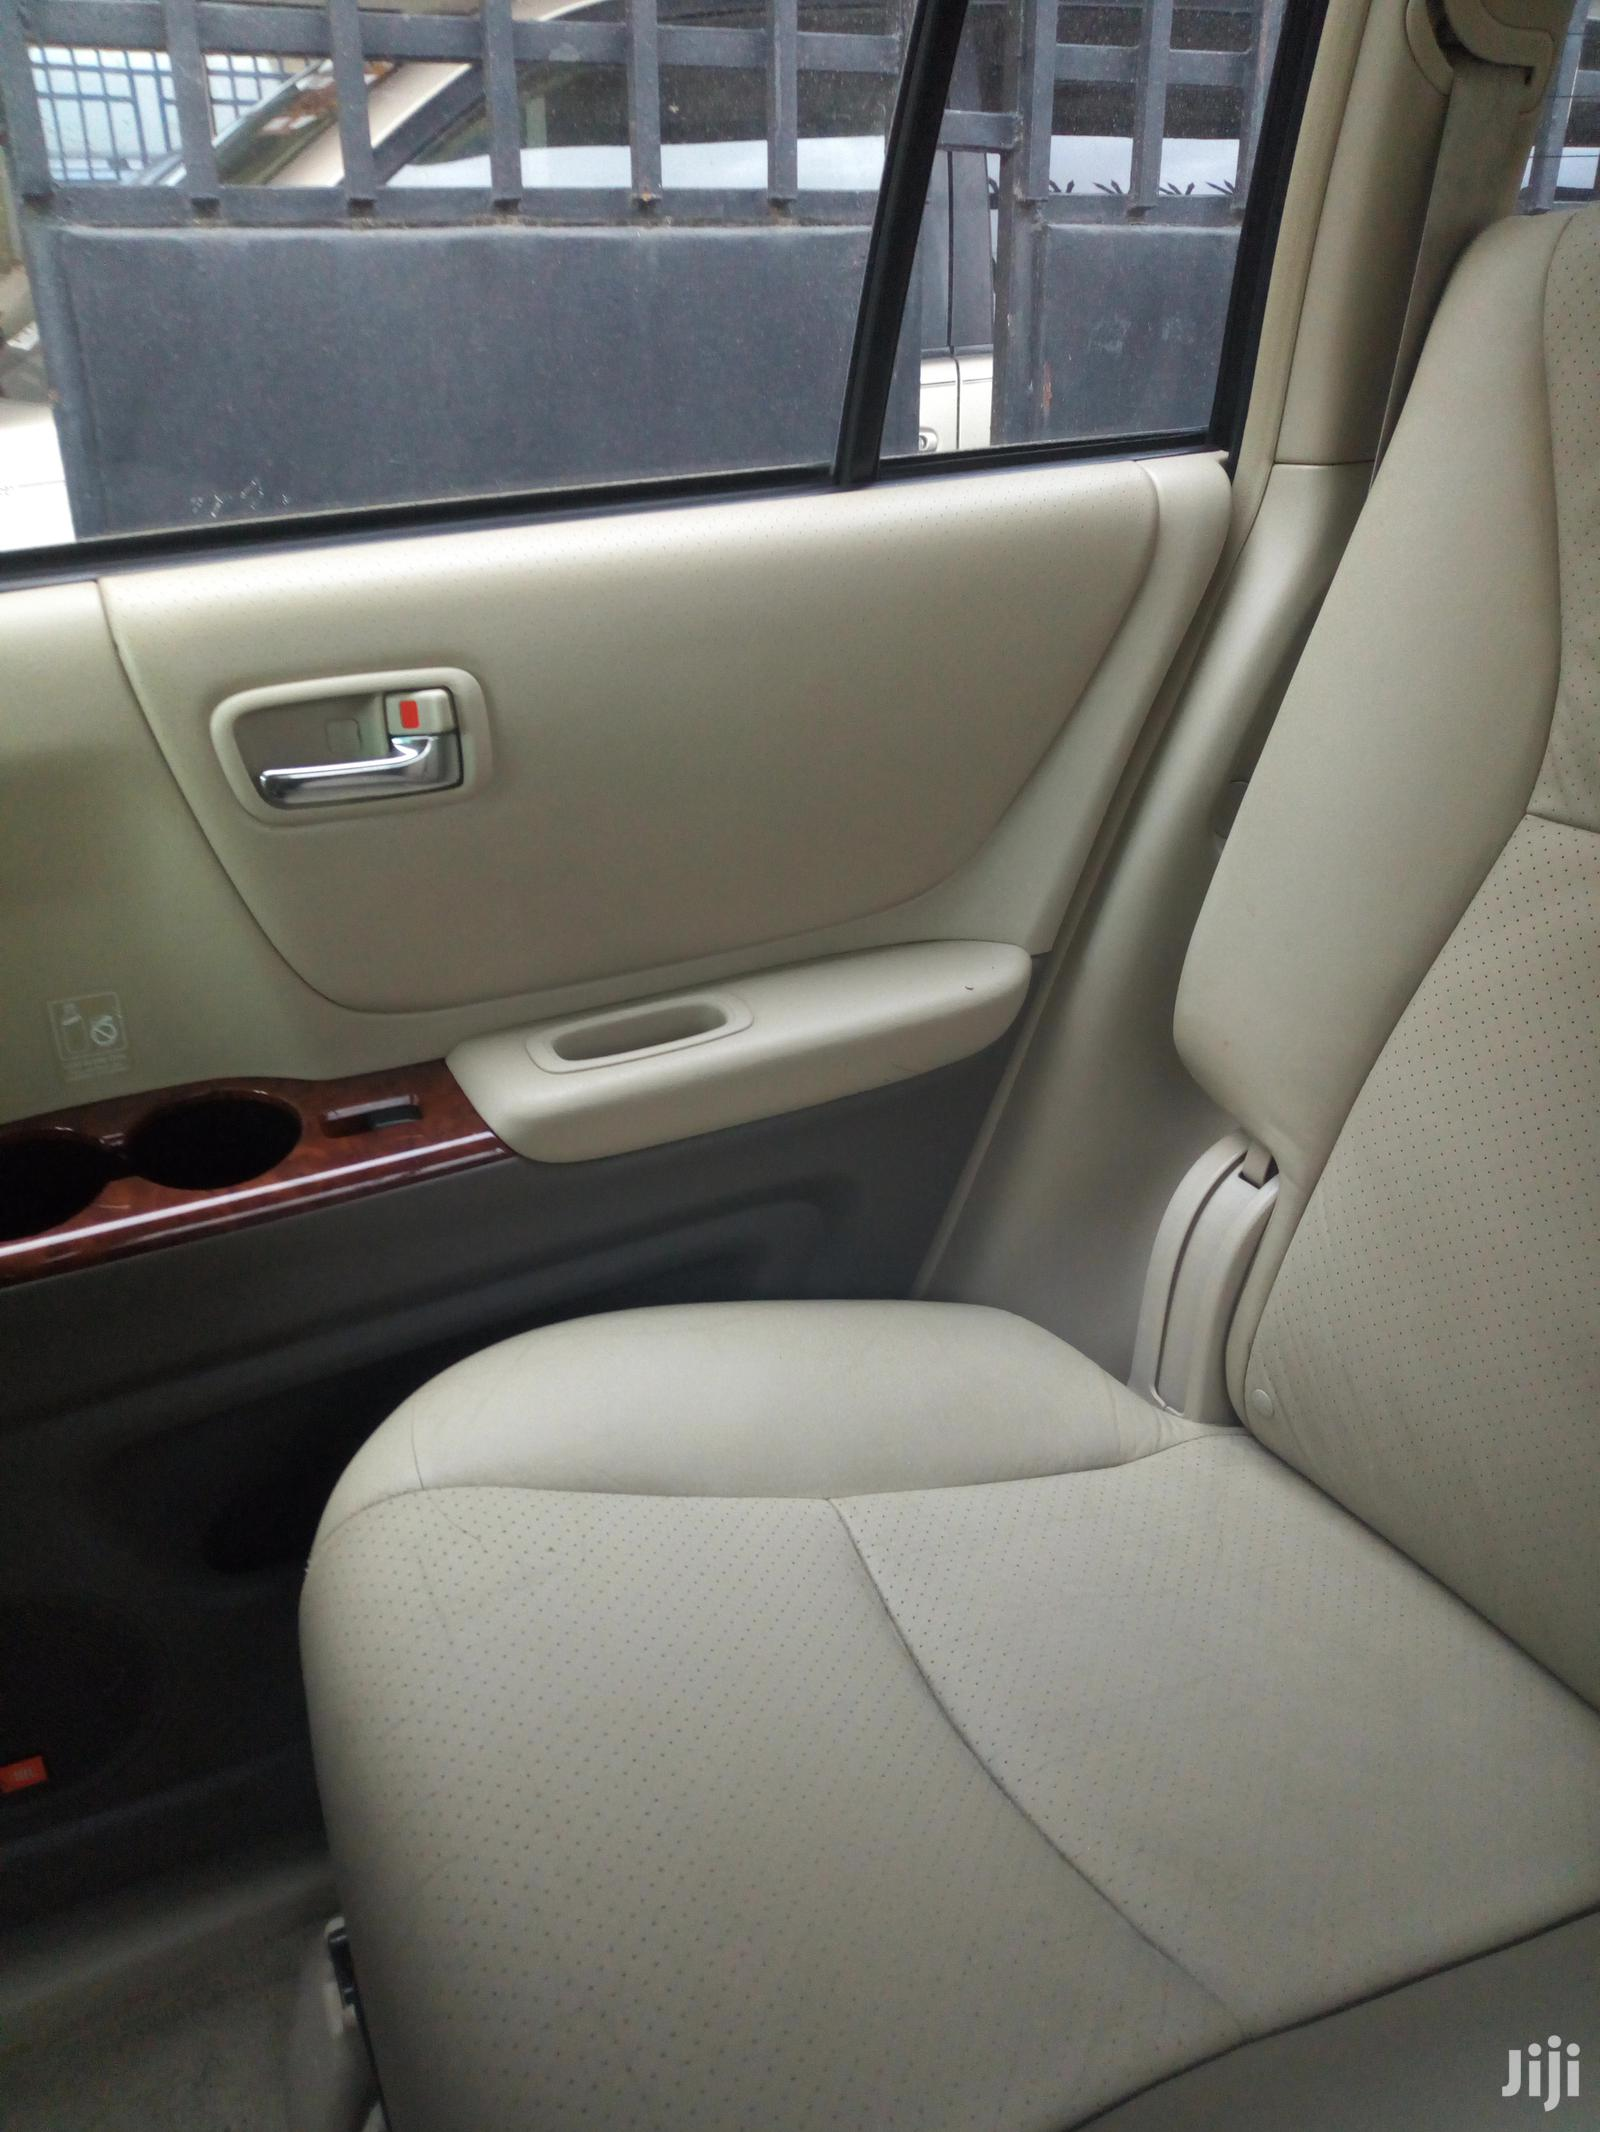 Archive: Toyota Highlander 2006 Limited V6 4x4 Blue